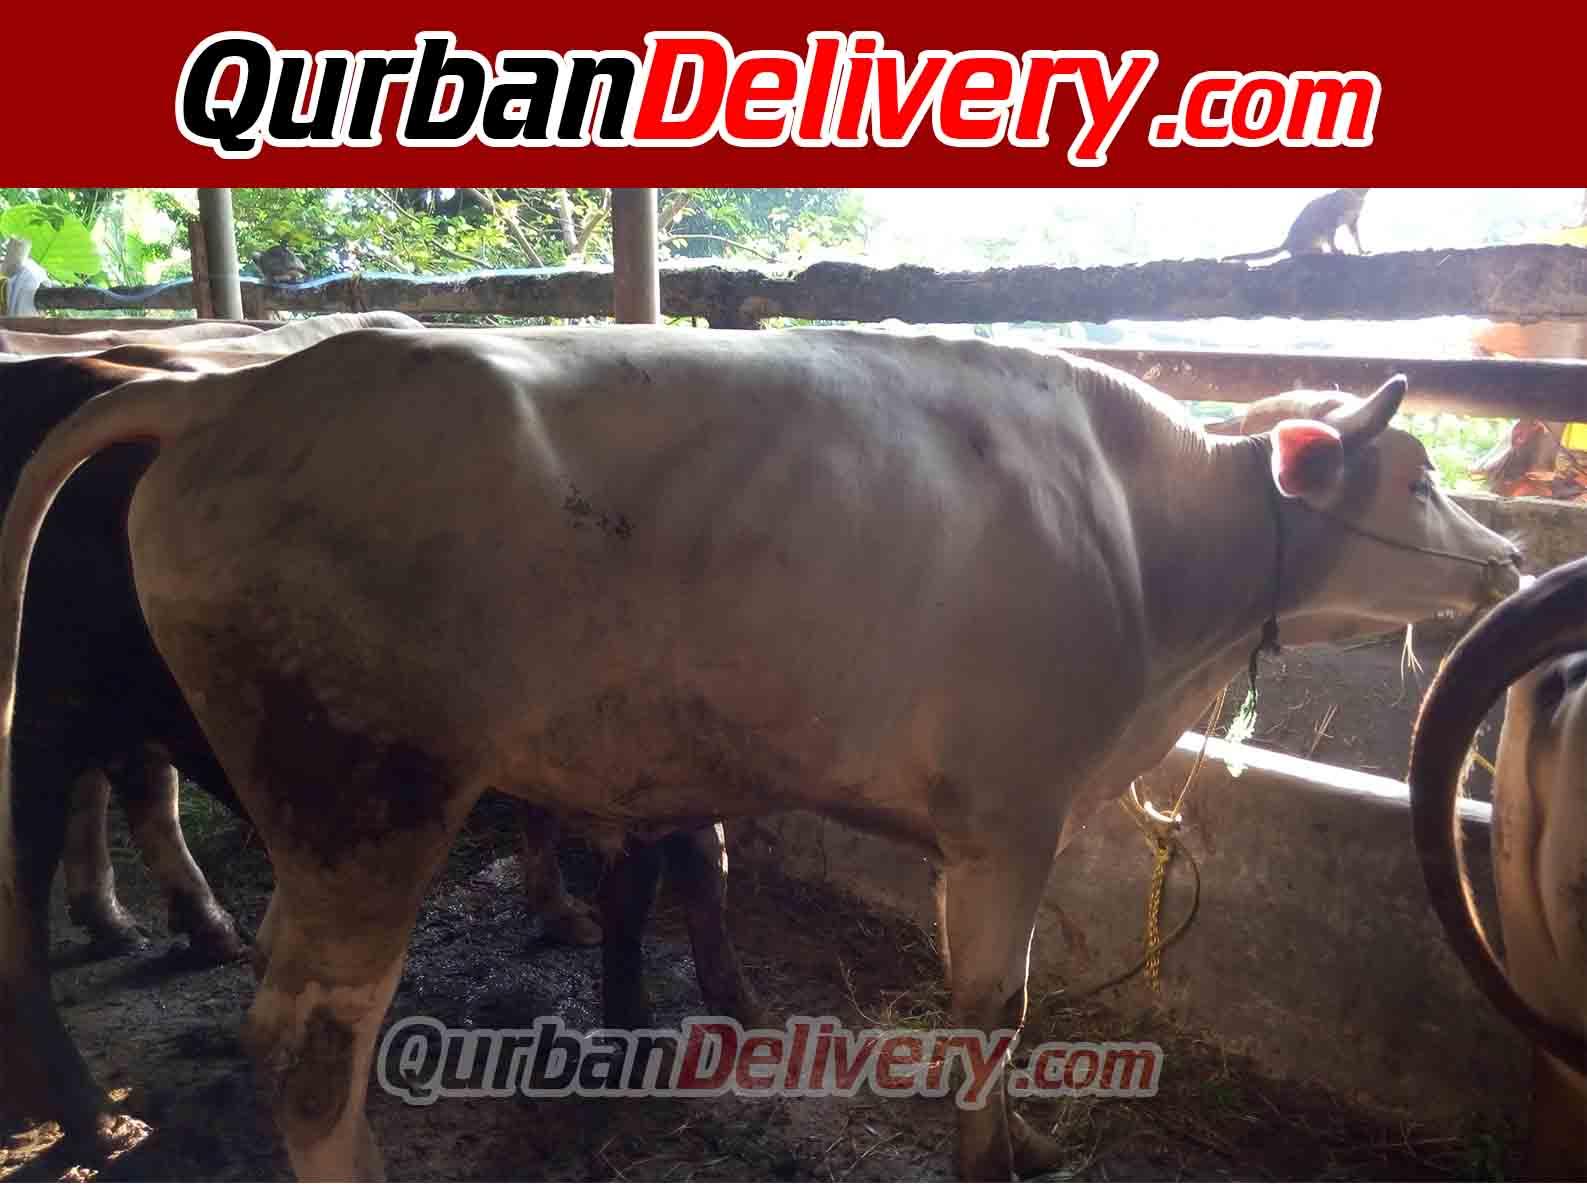 Harga Sapi Limosin Qurban Di Cikarang Prediksi 2020-Qurban Delivery